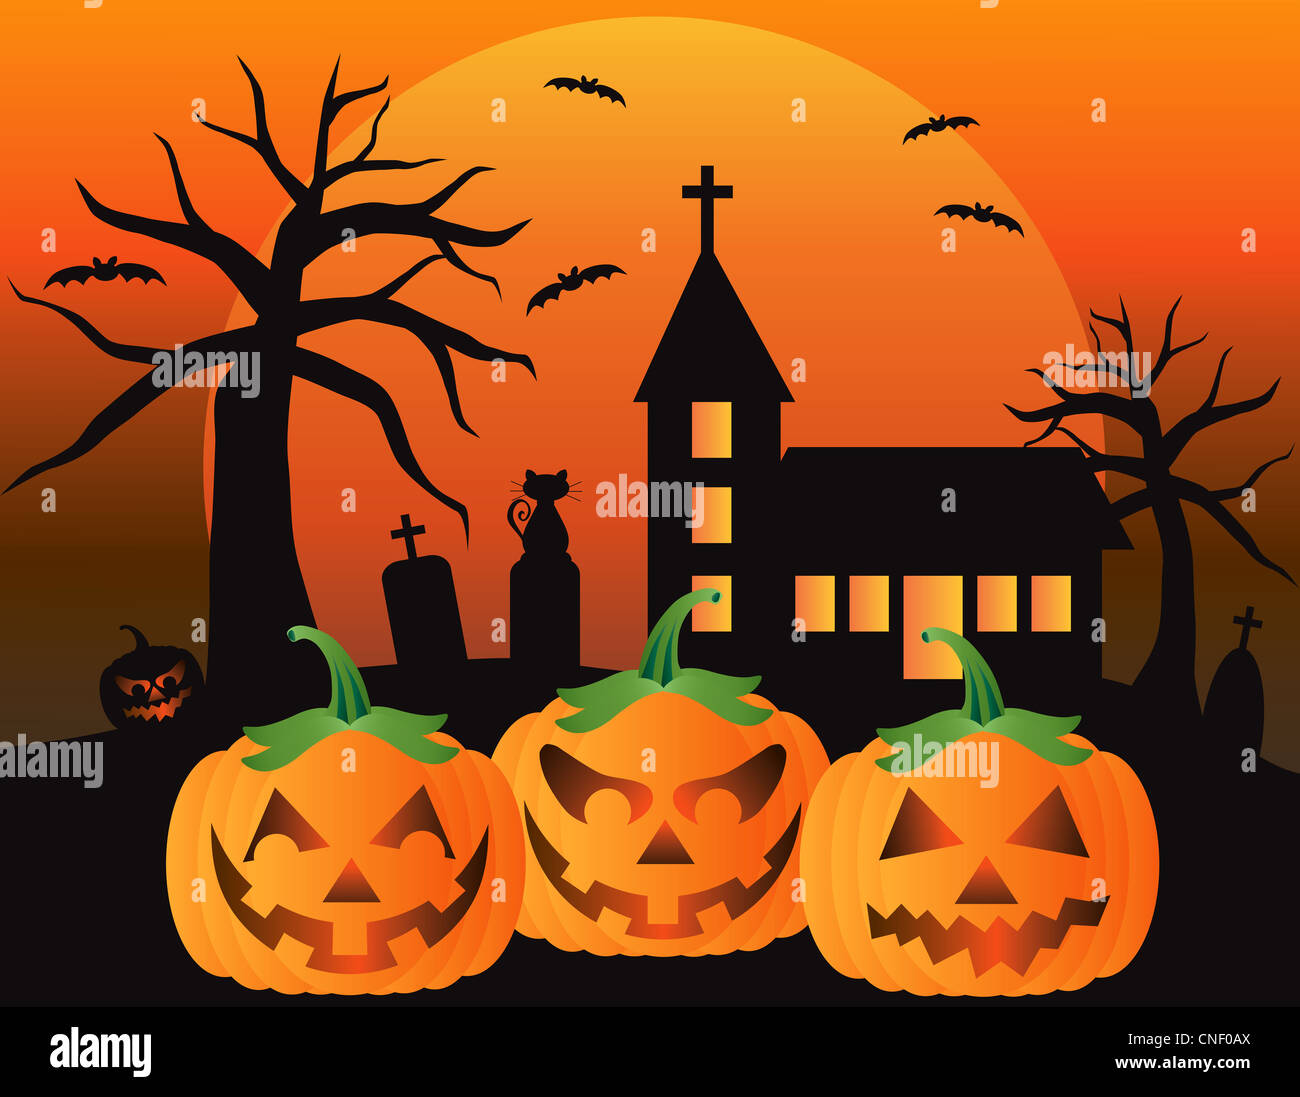 halloween jack o lantern pumpkins with church moon black cat and bats illustration